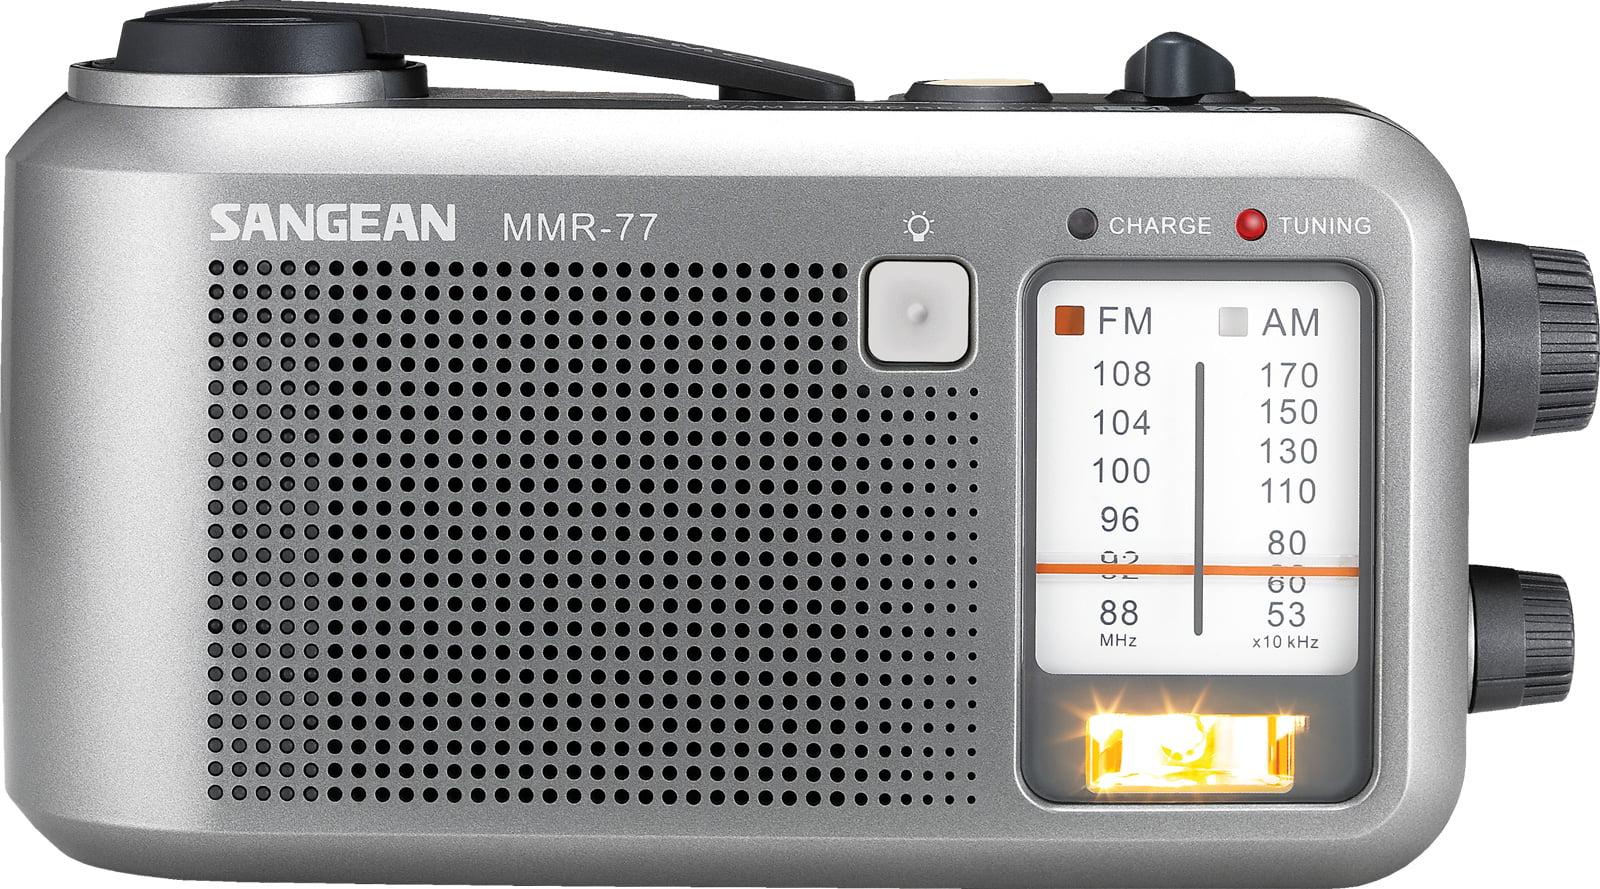 Sangean Compact Emergency Water-resistant Hand Crank AM FM Radio with Built-in Speaker by Sangean